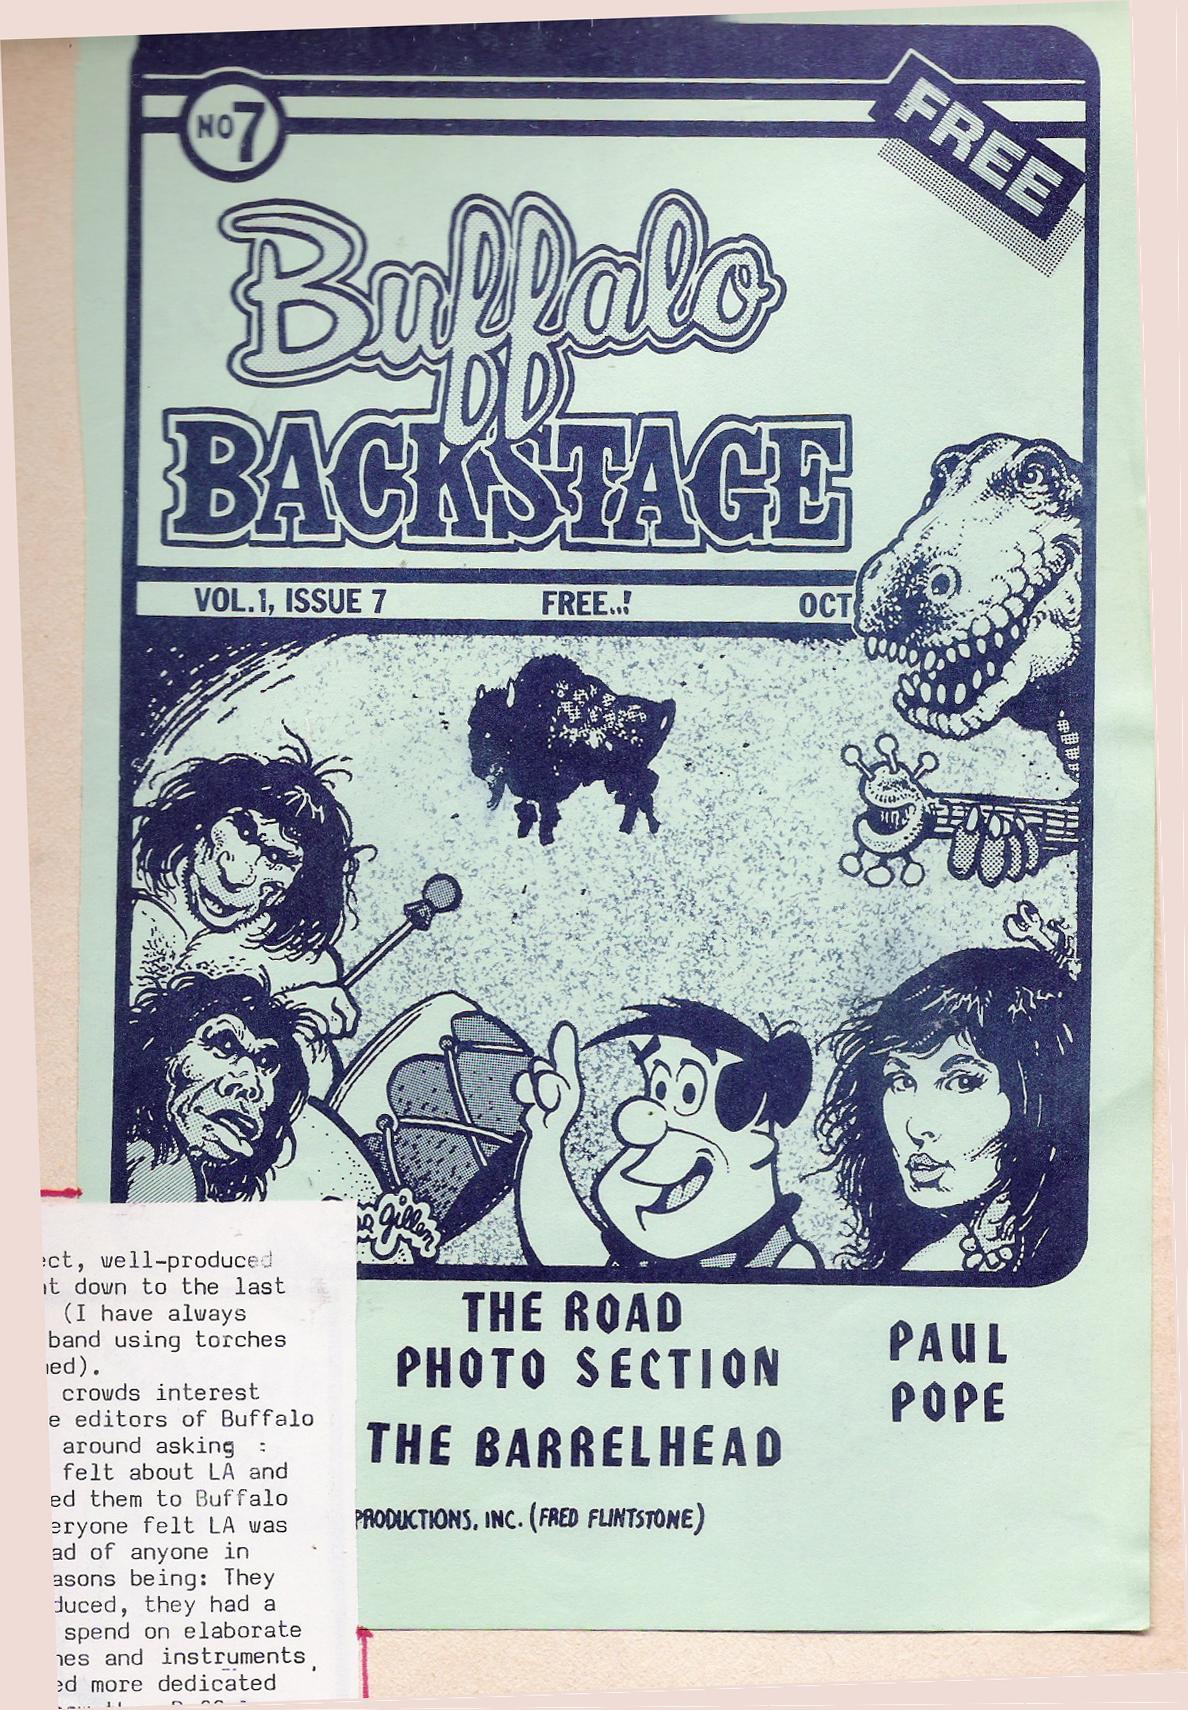 Buffalo Backstage Cover Art Oct. 1981